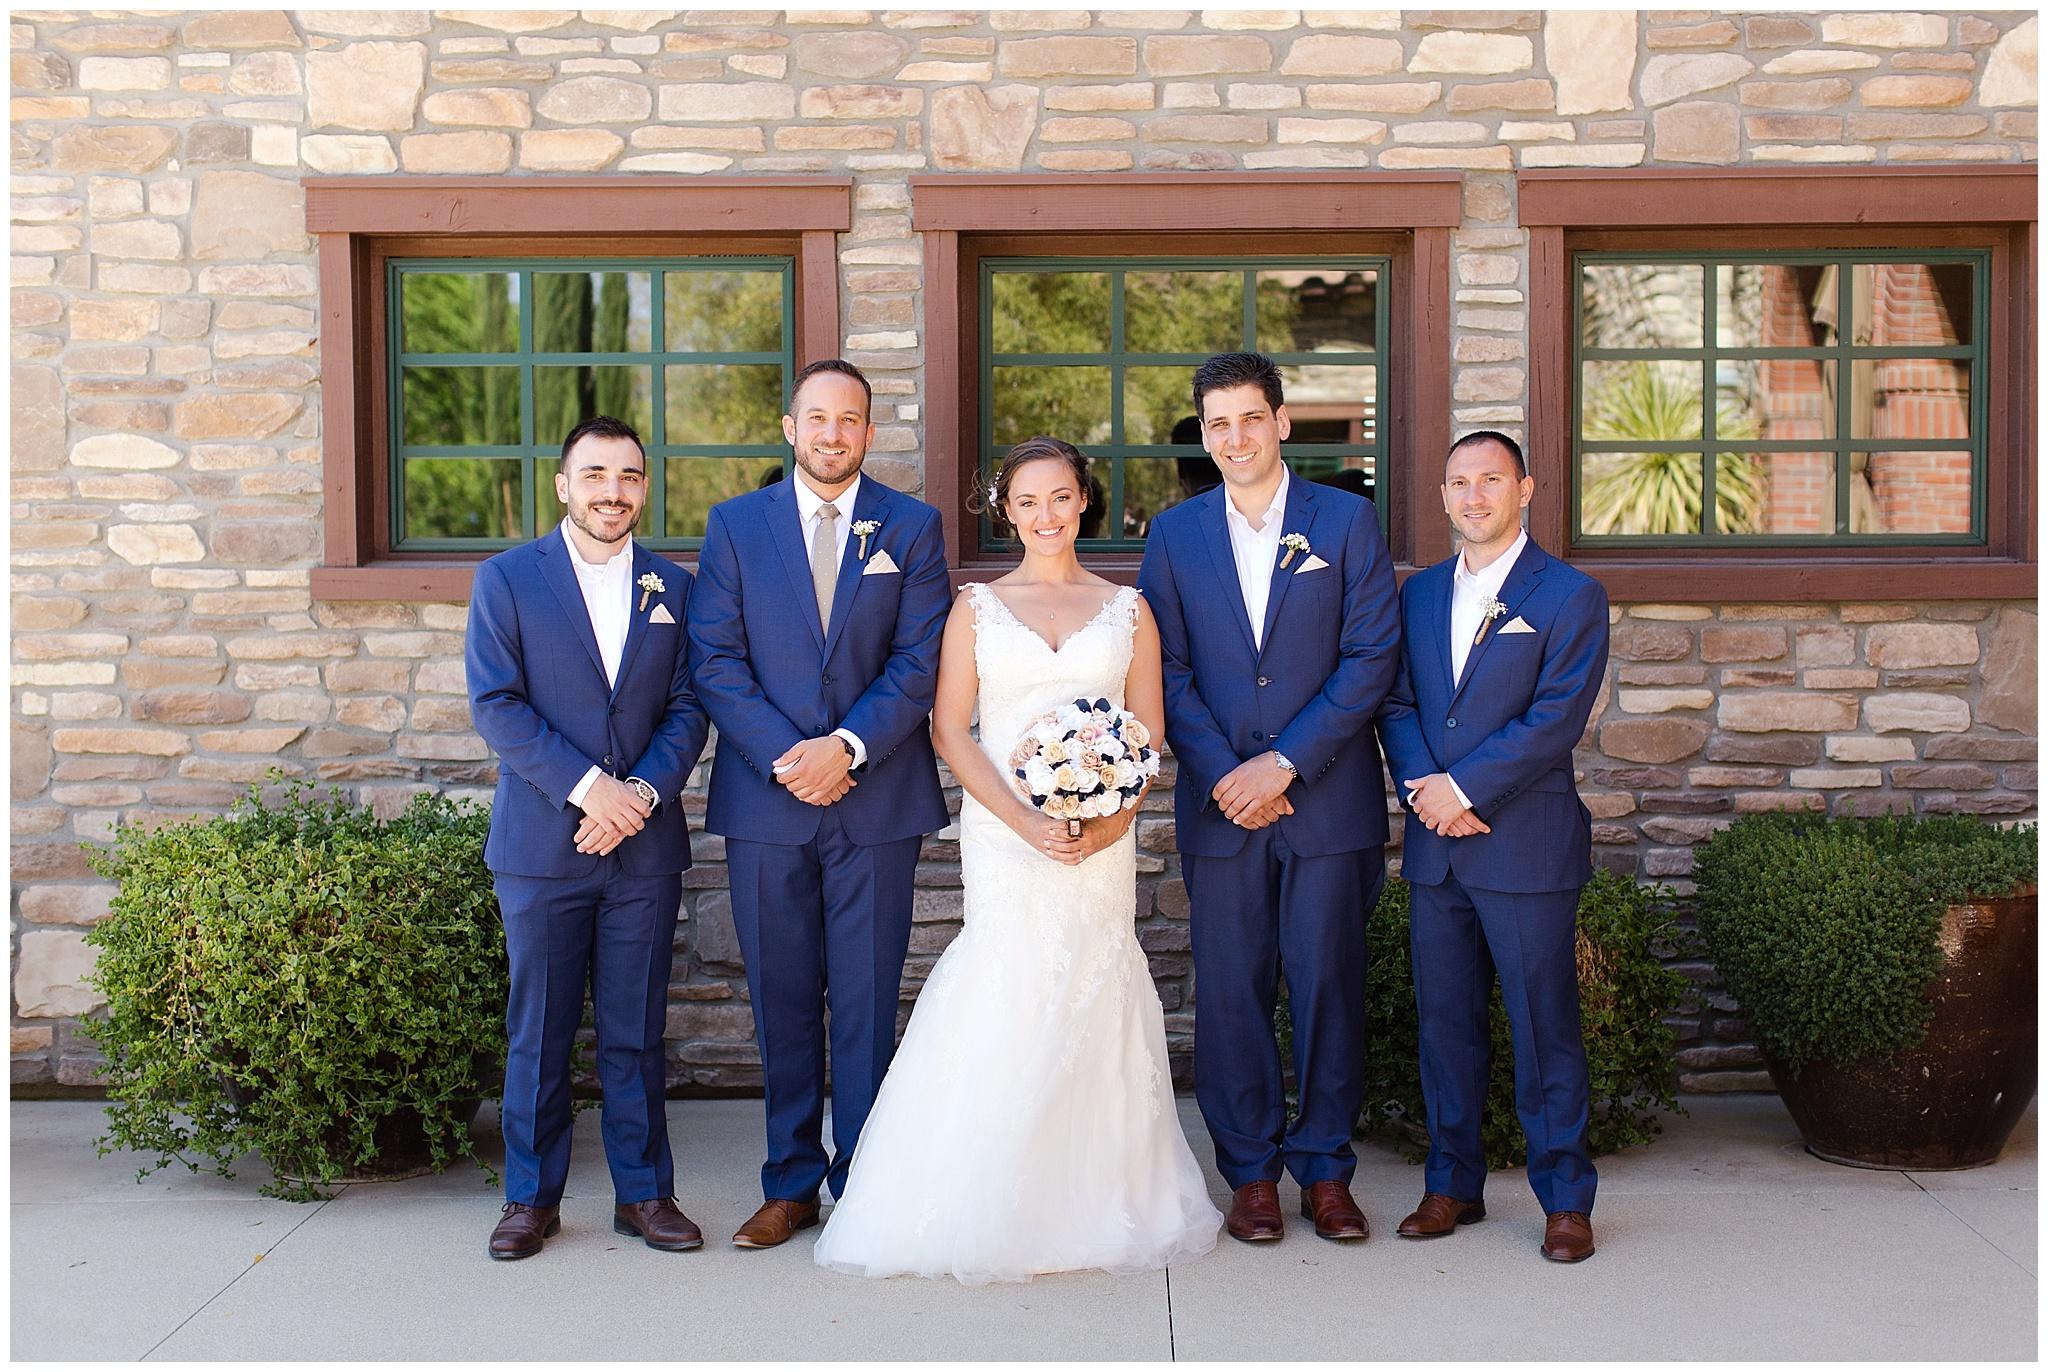 Vinny & Cayt Wedding 4-26-18-0994.jpg